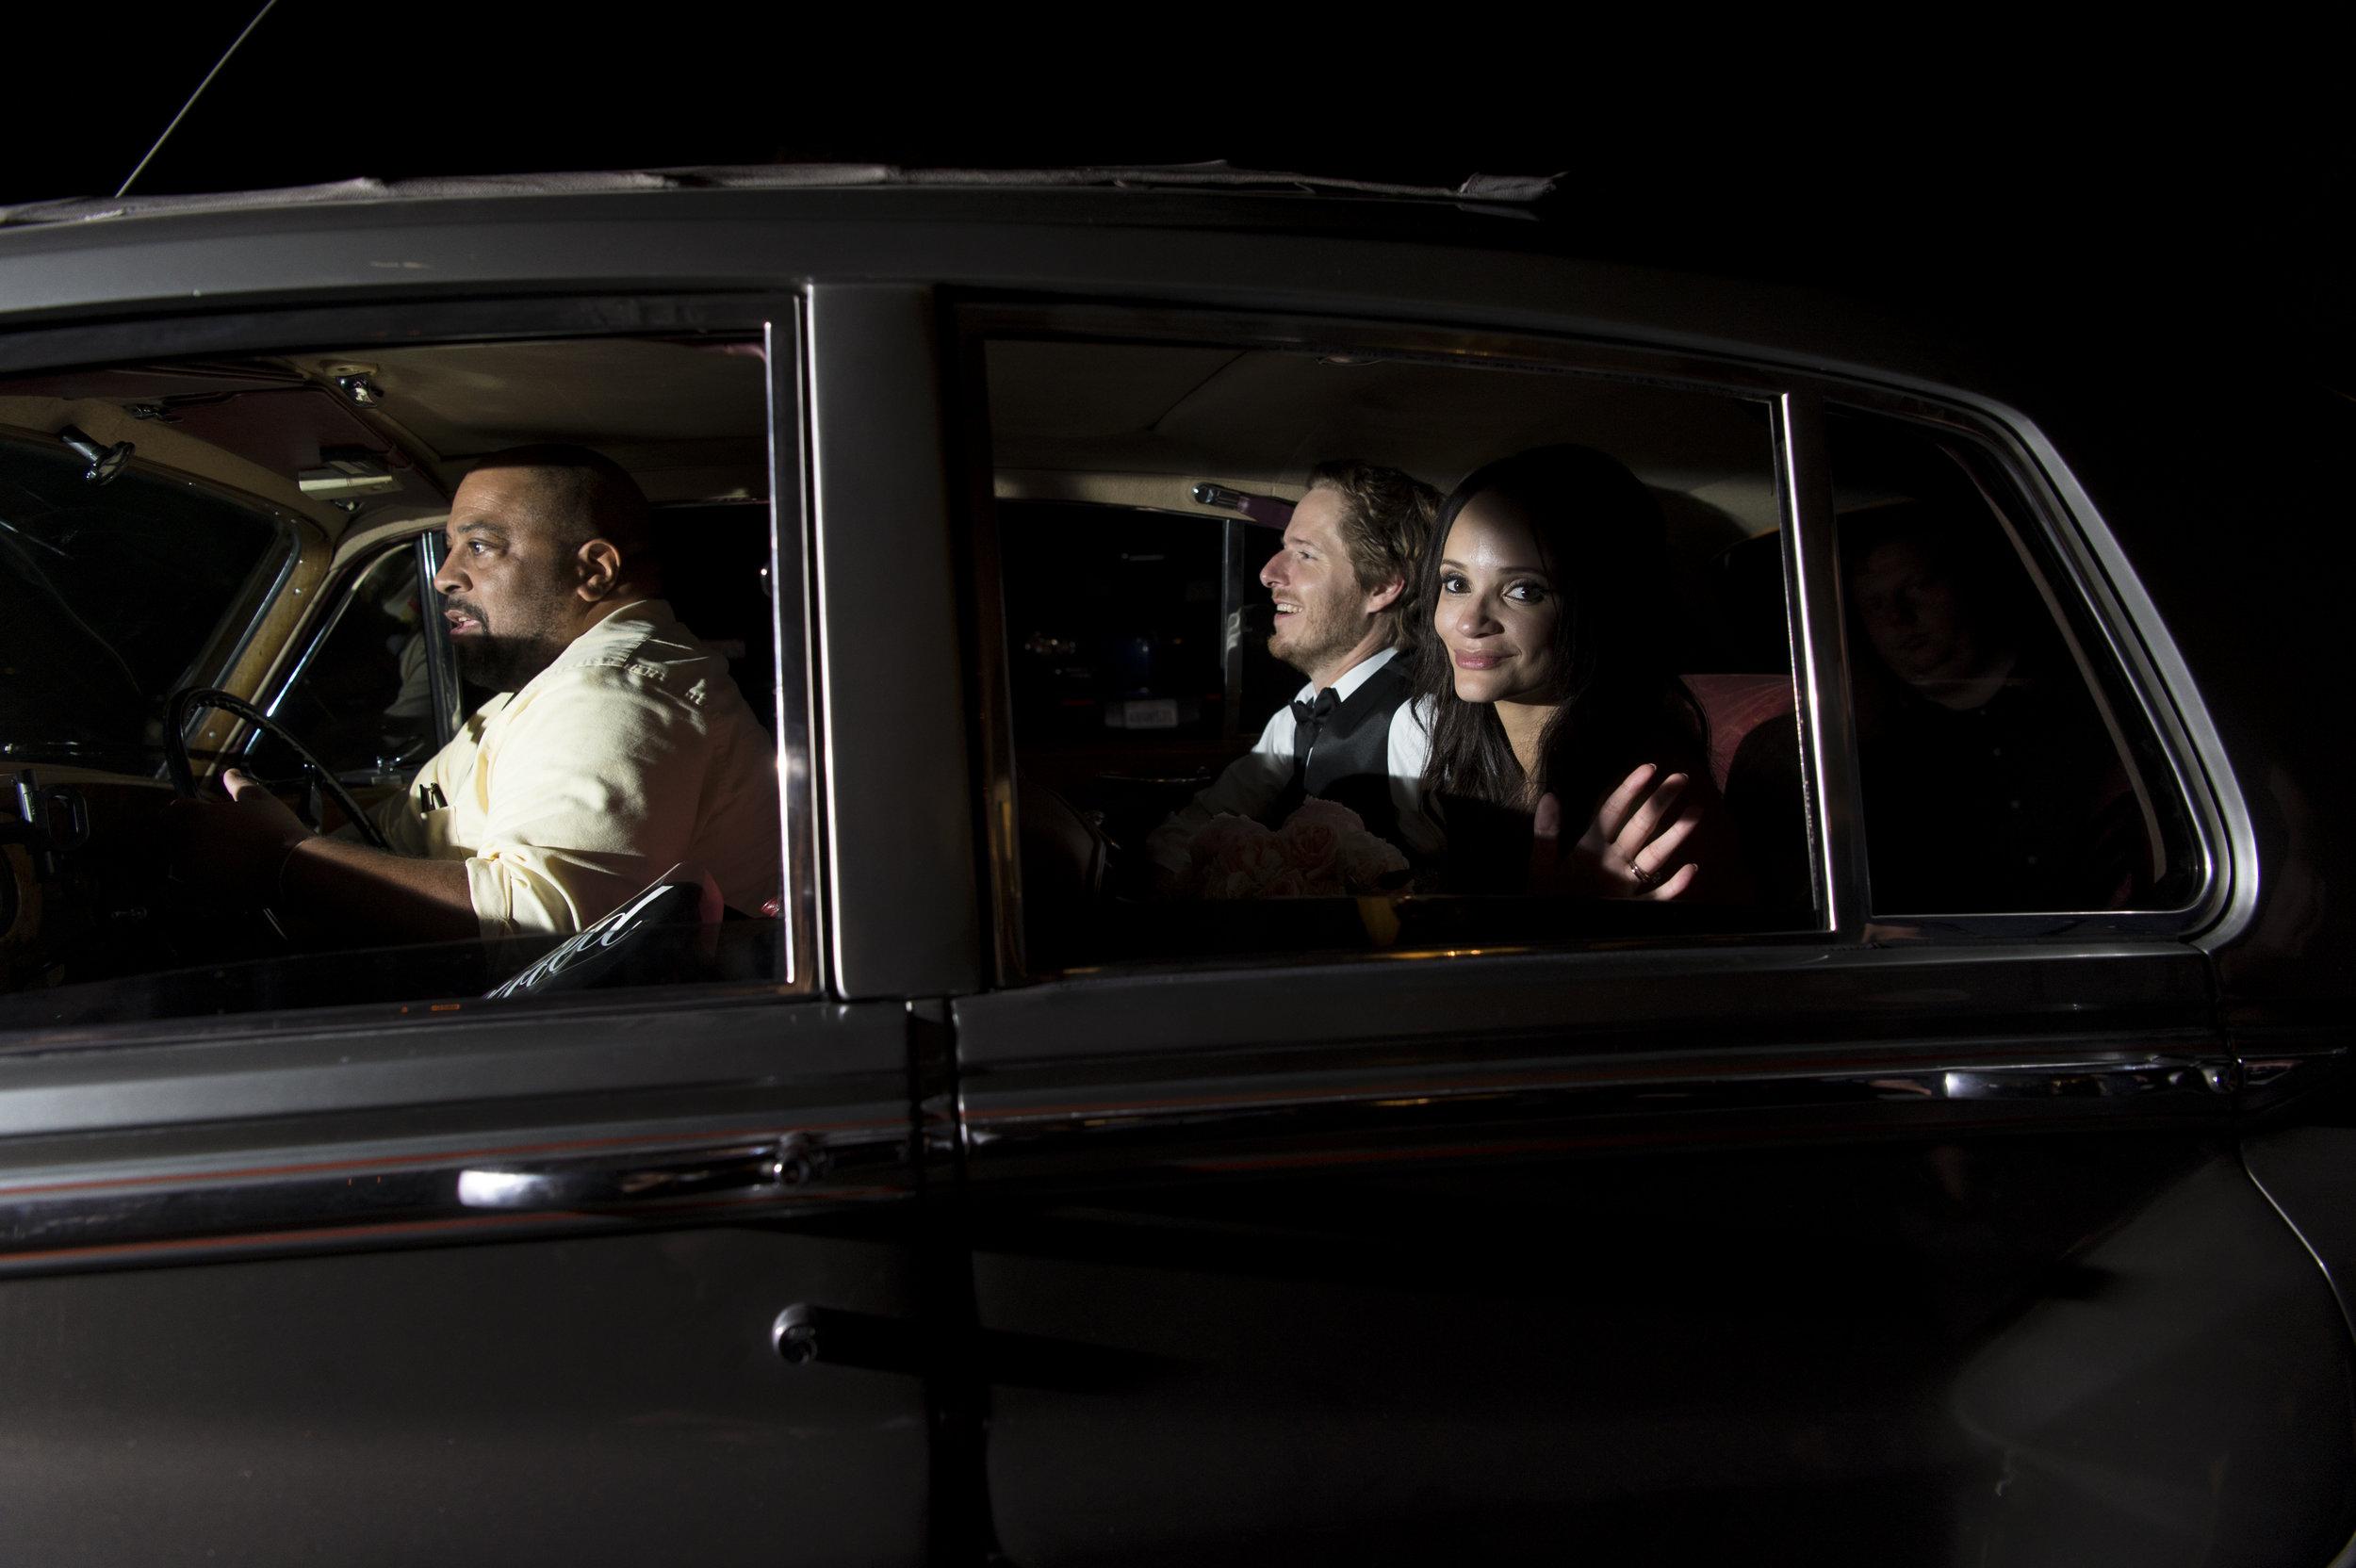 Vintage Wedding Getaway Car - A Romantic Bel Air Bay Club Ocean-View Wedding - Southern California Wedding - Kevin Dinh Photography